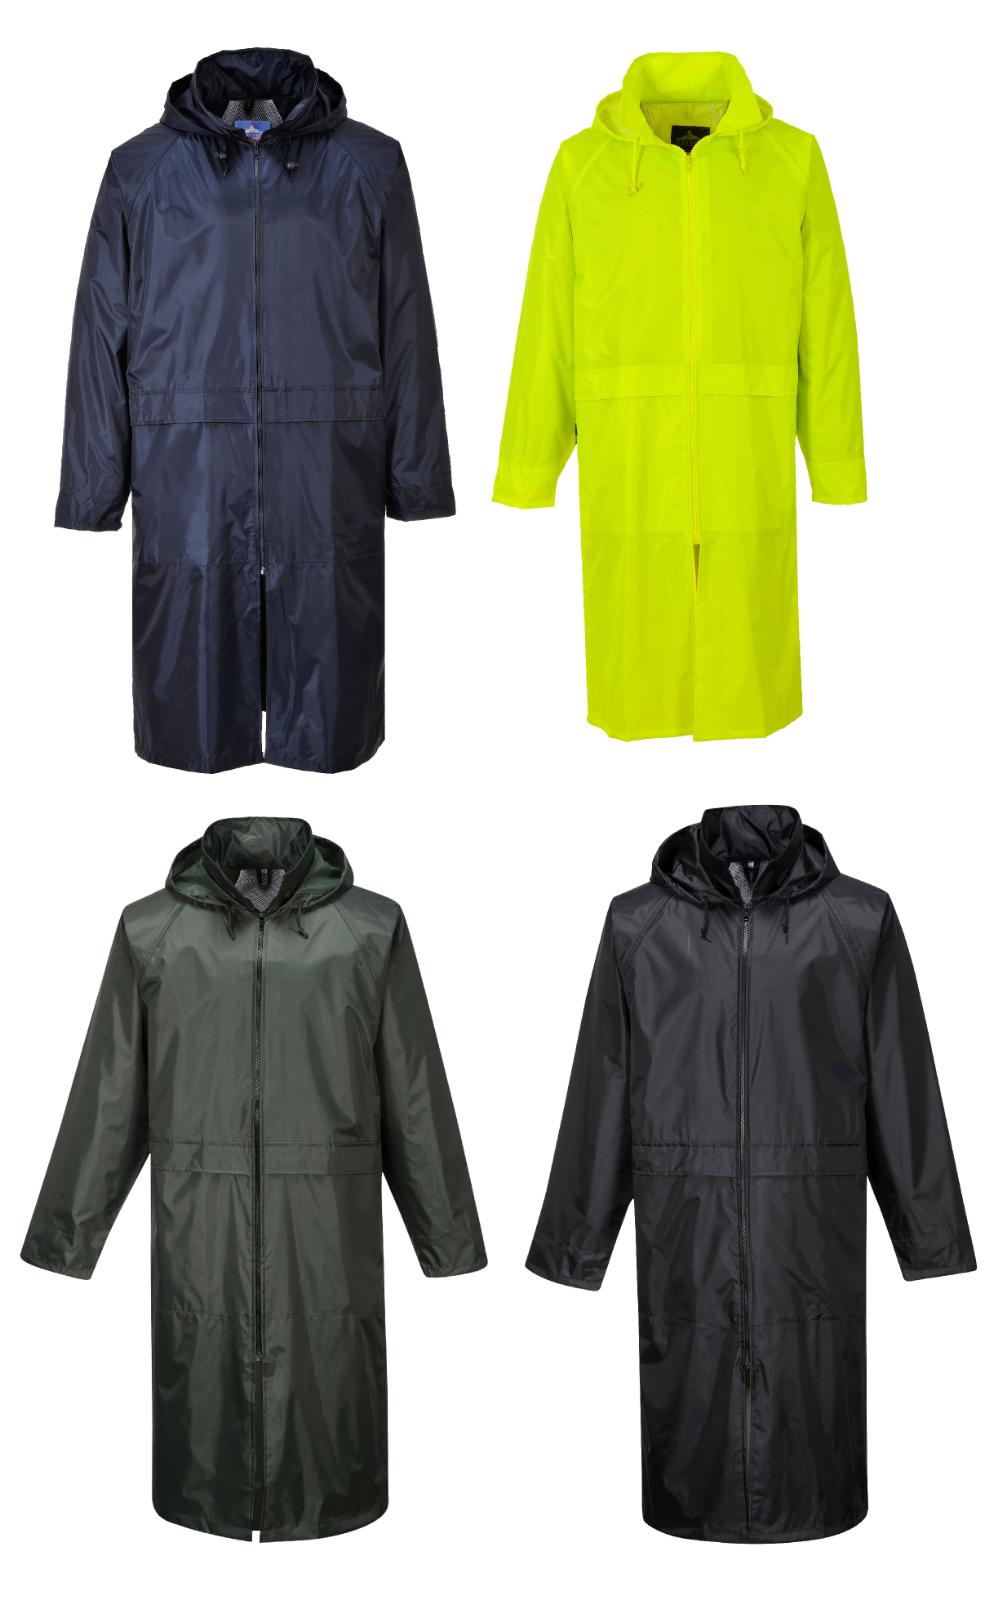 Portwest S438 Classic Adult Long Lightweight Waterproof Rain Coat Jacket Vented